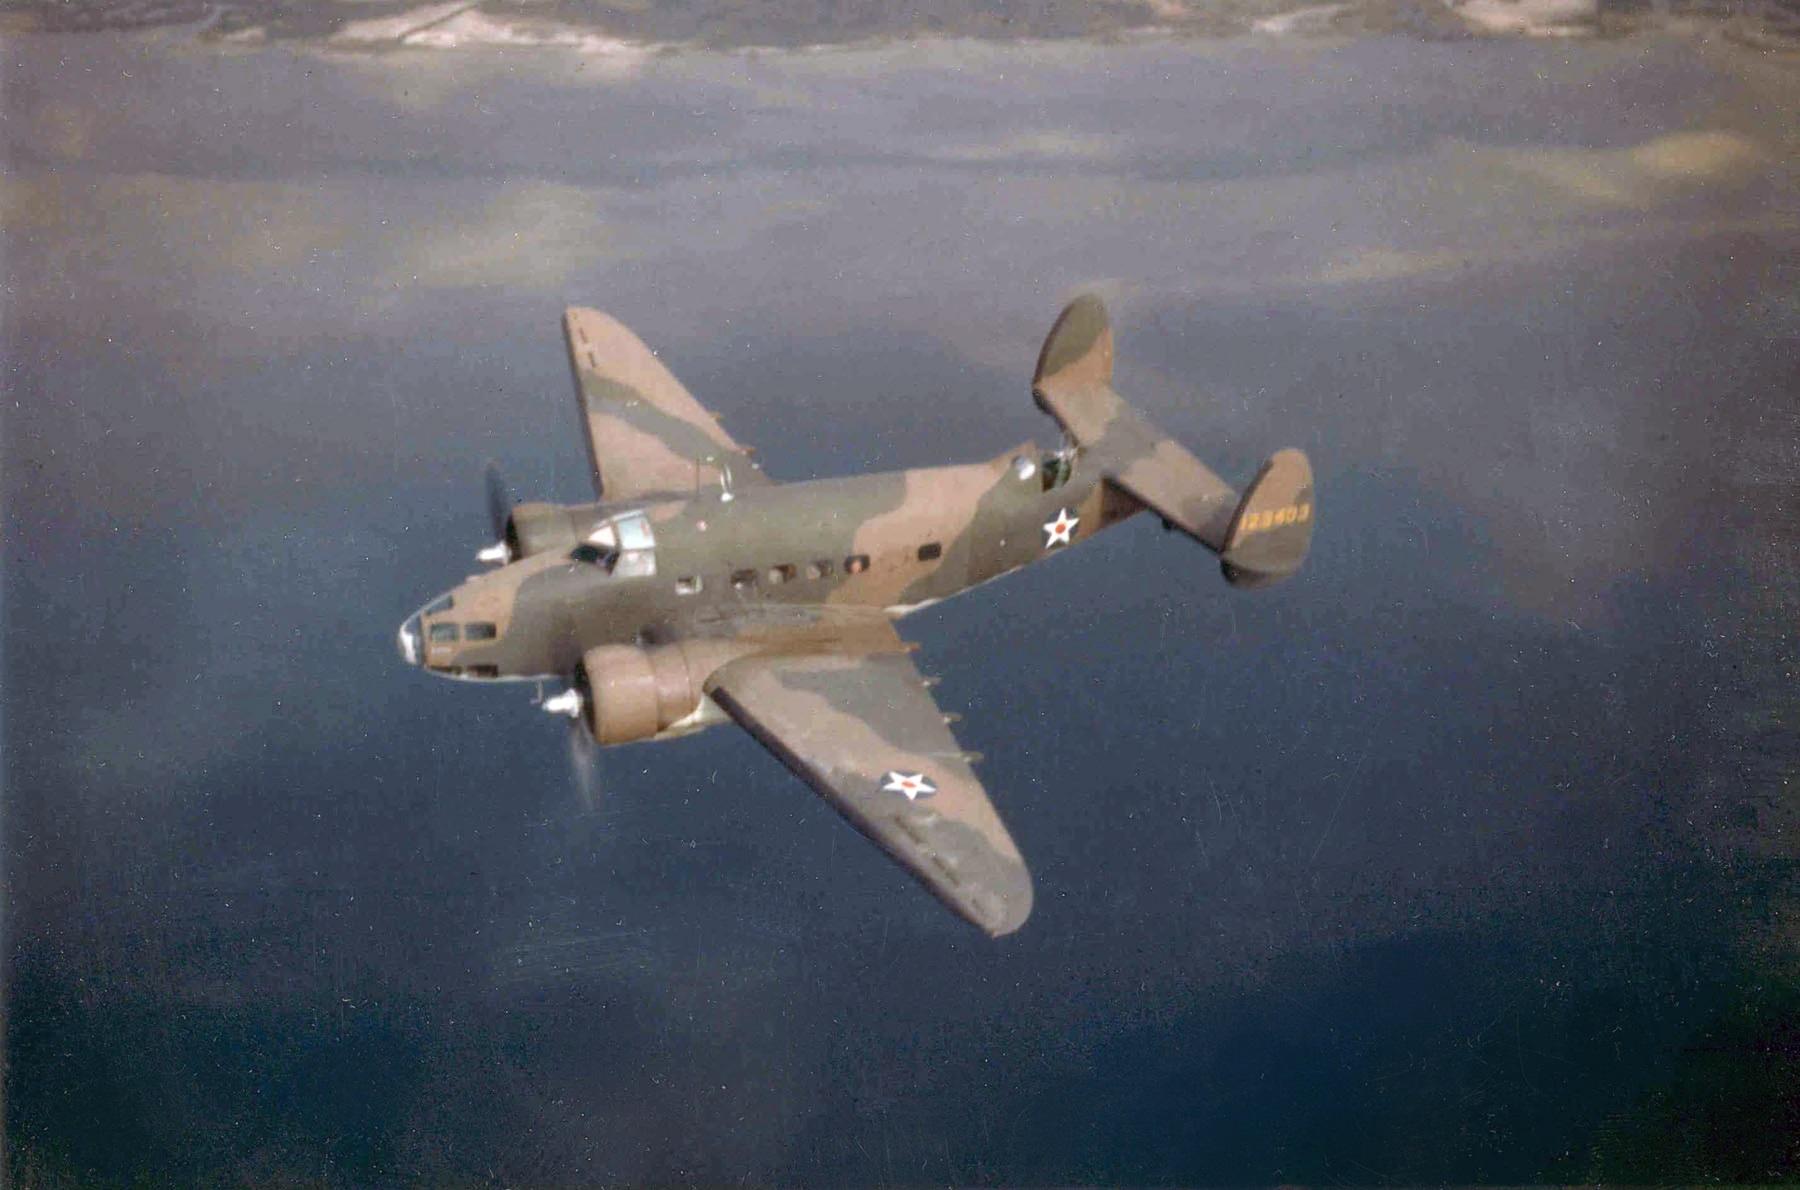 Camden Airfield Lockheed_A-29_Hudson_USAAF_in_flight_c1941